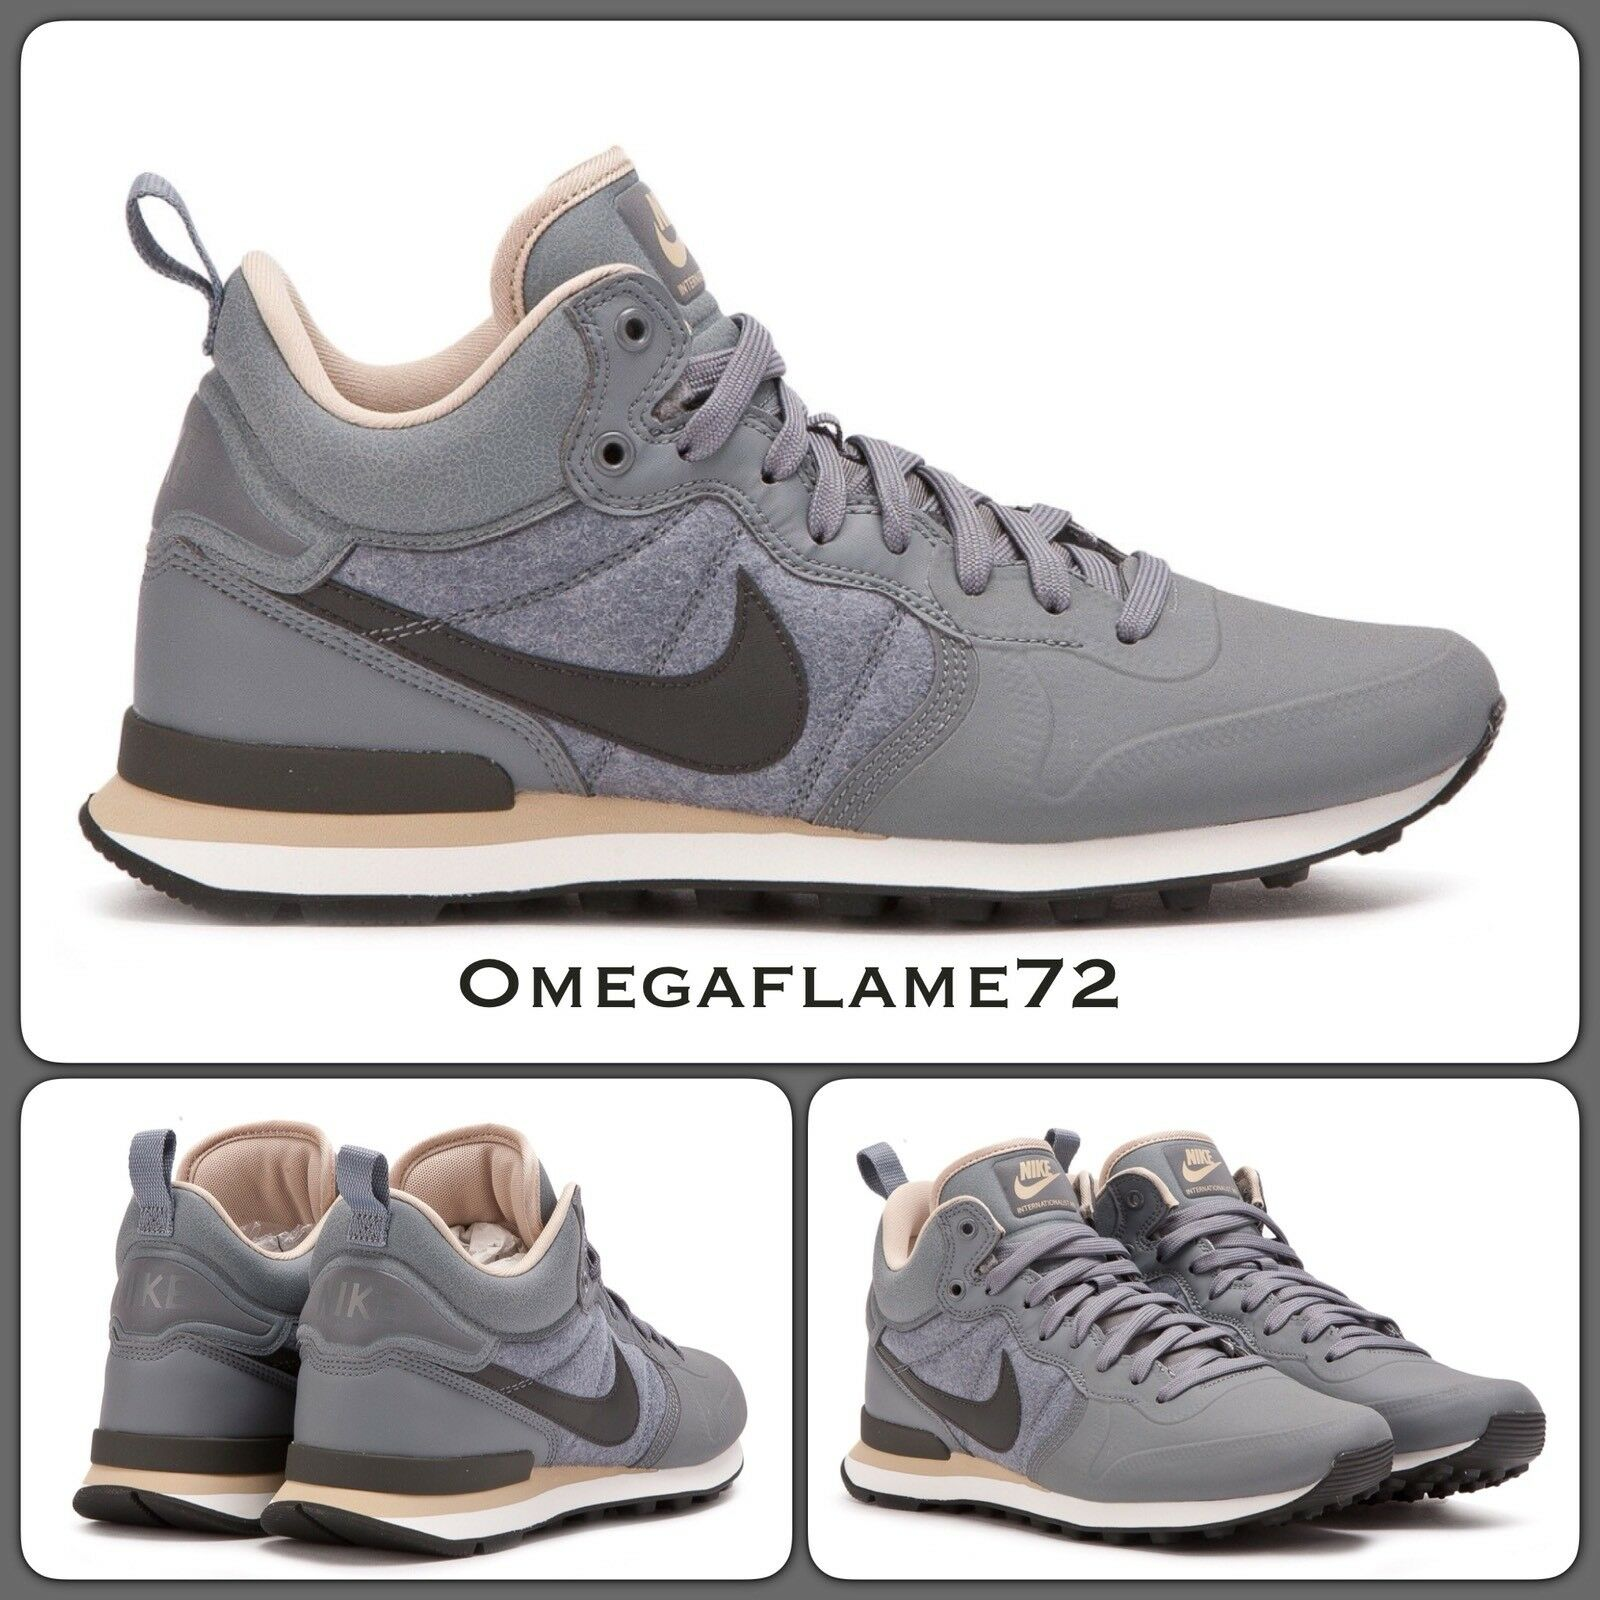 Nike Internazionalista Utility scarpe da ginnastica avvio 857937-003, Tg. UE 42, US 8.5   Varietà Grande    Sig/Sig Ra Scarpa